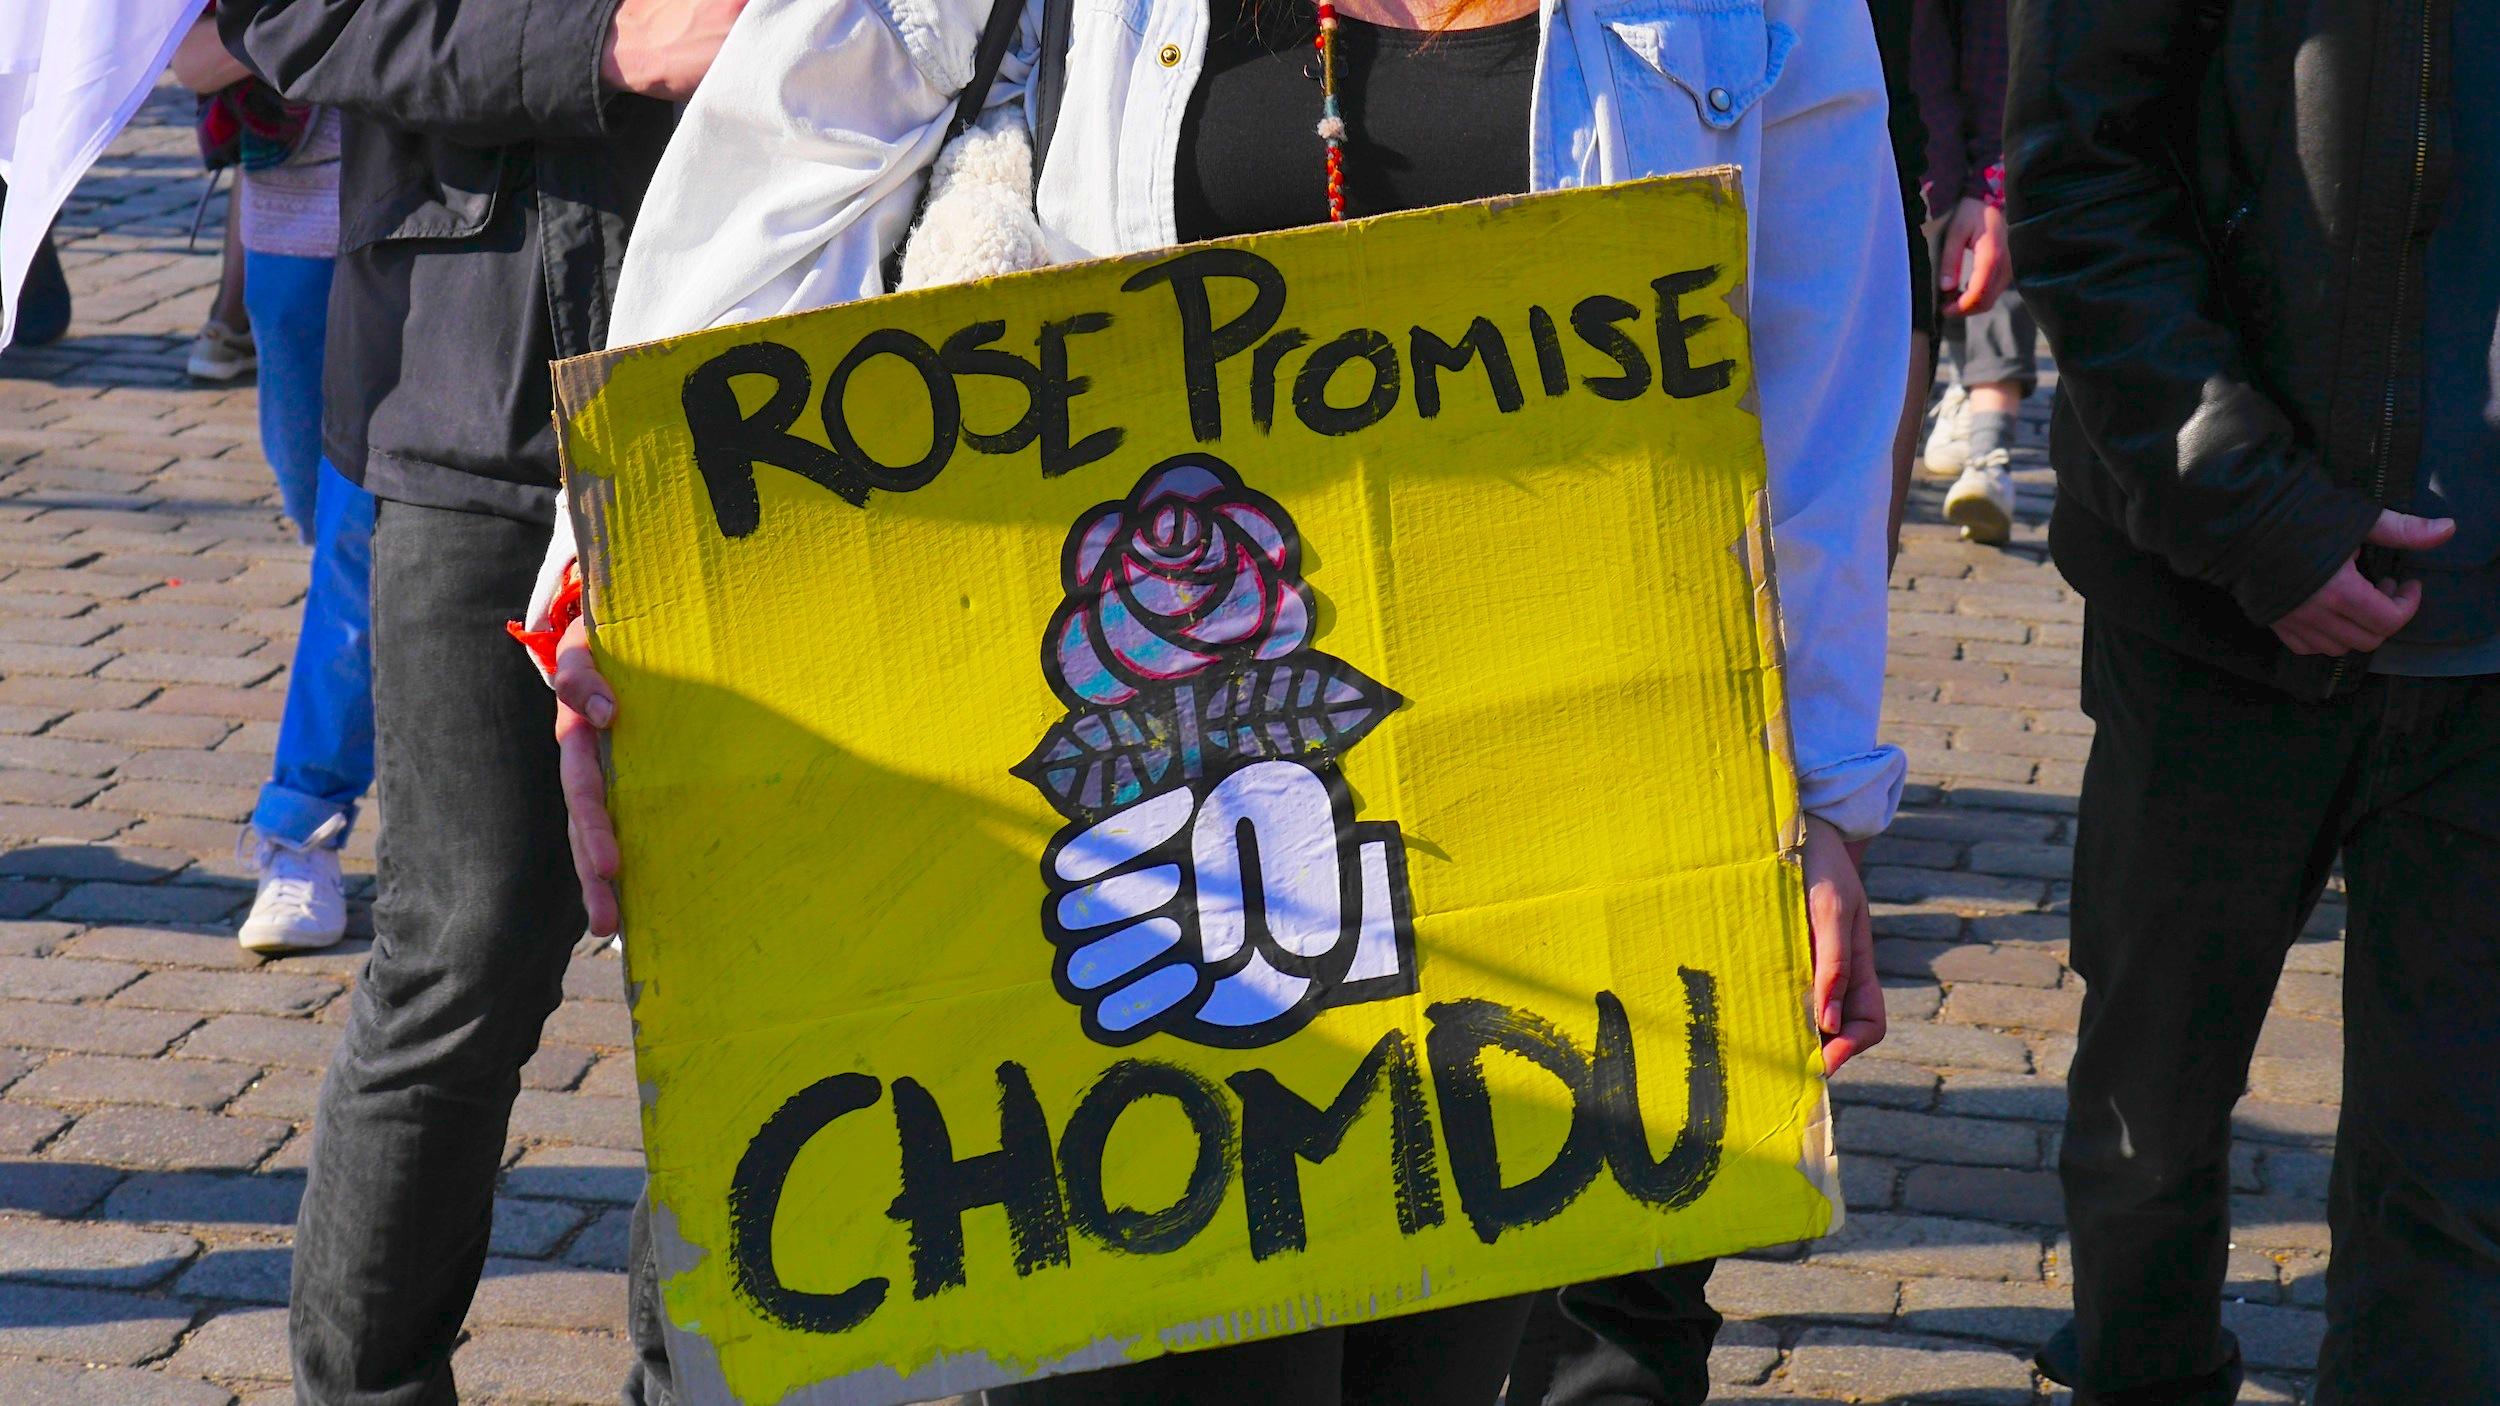 «Rose promise, chomdu»